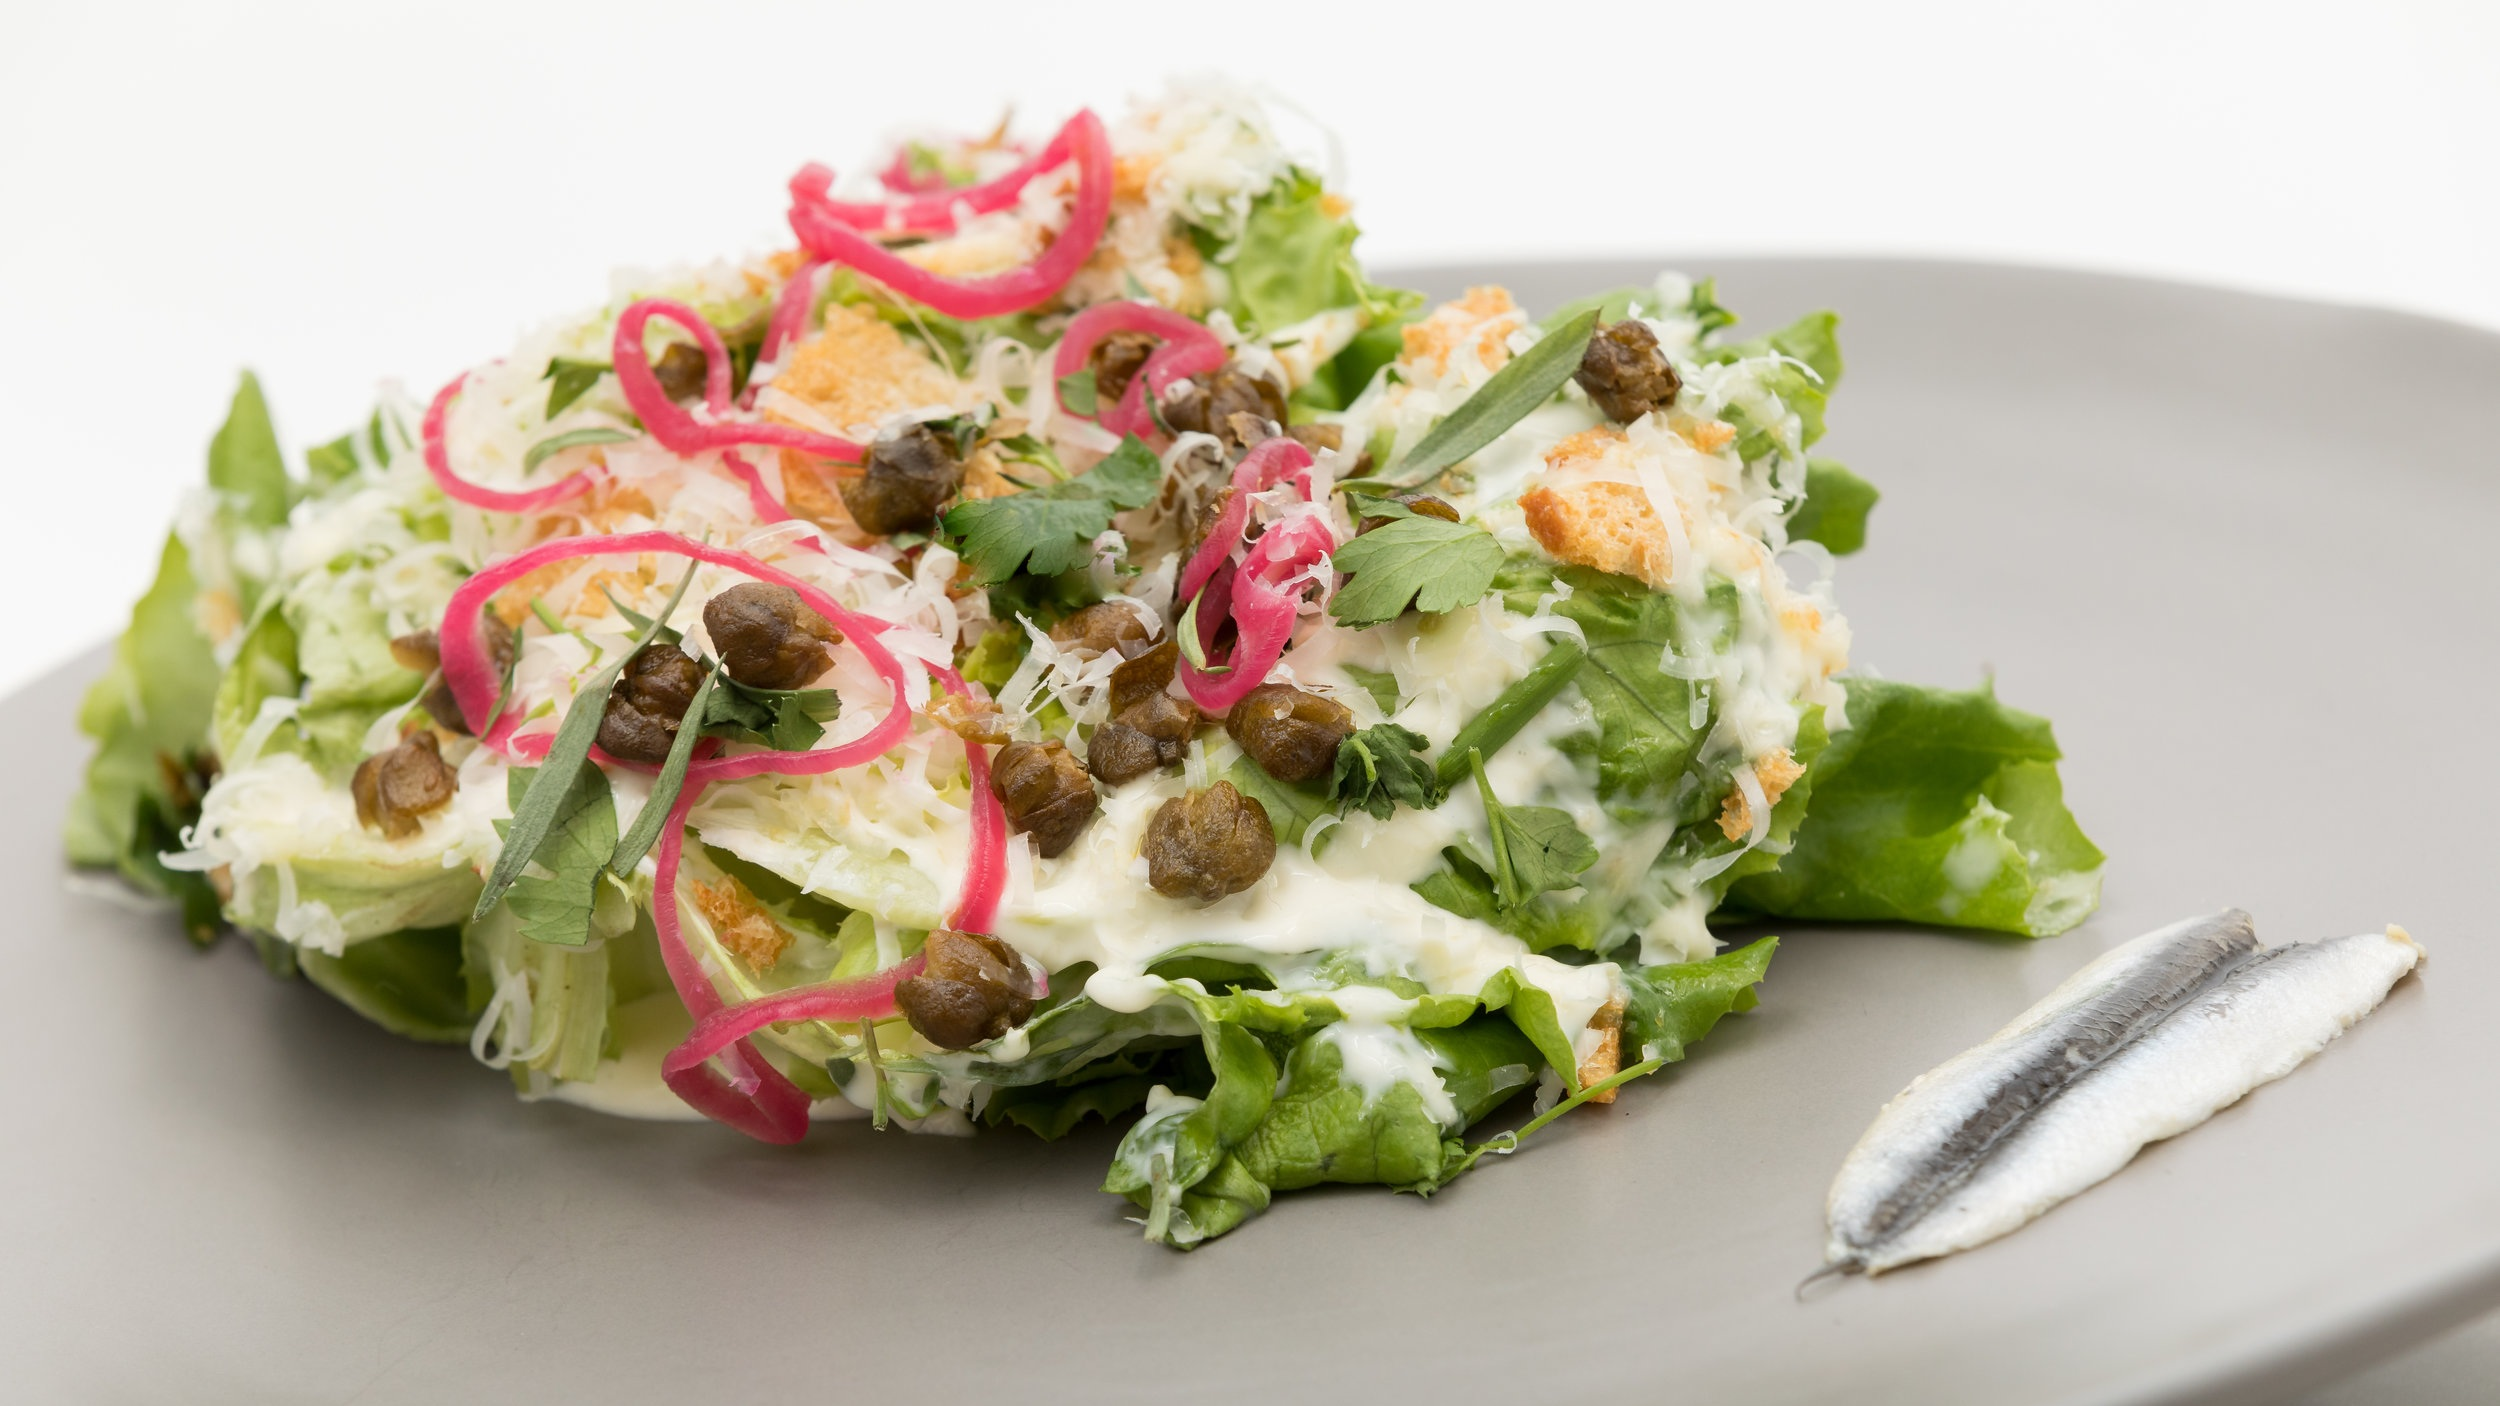 Salvona Caesar w_ Gotham Greens Lettuce, White Anchovy, Parmesan_Amanda Gentile3.jpg